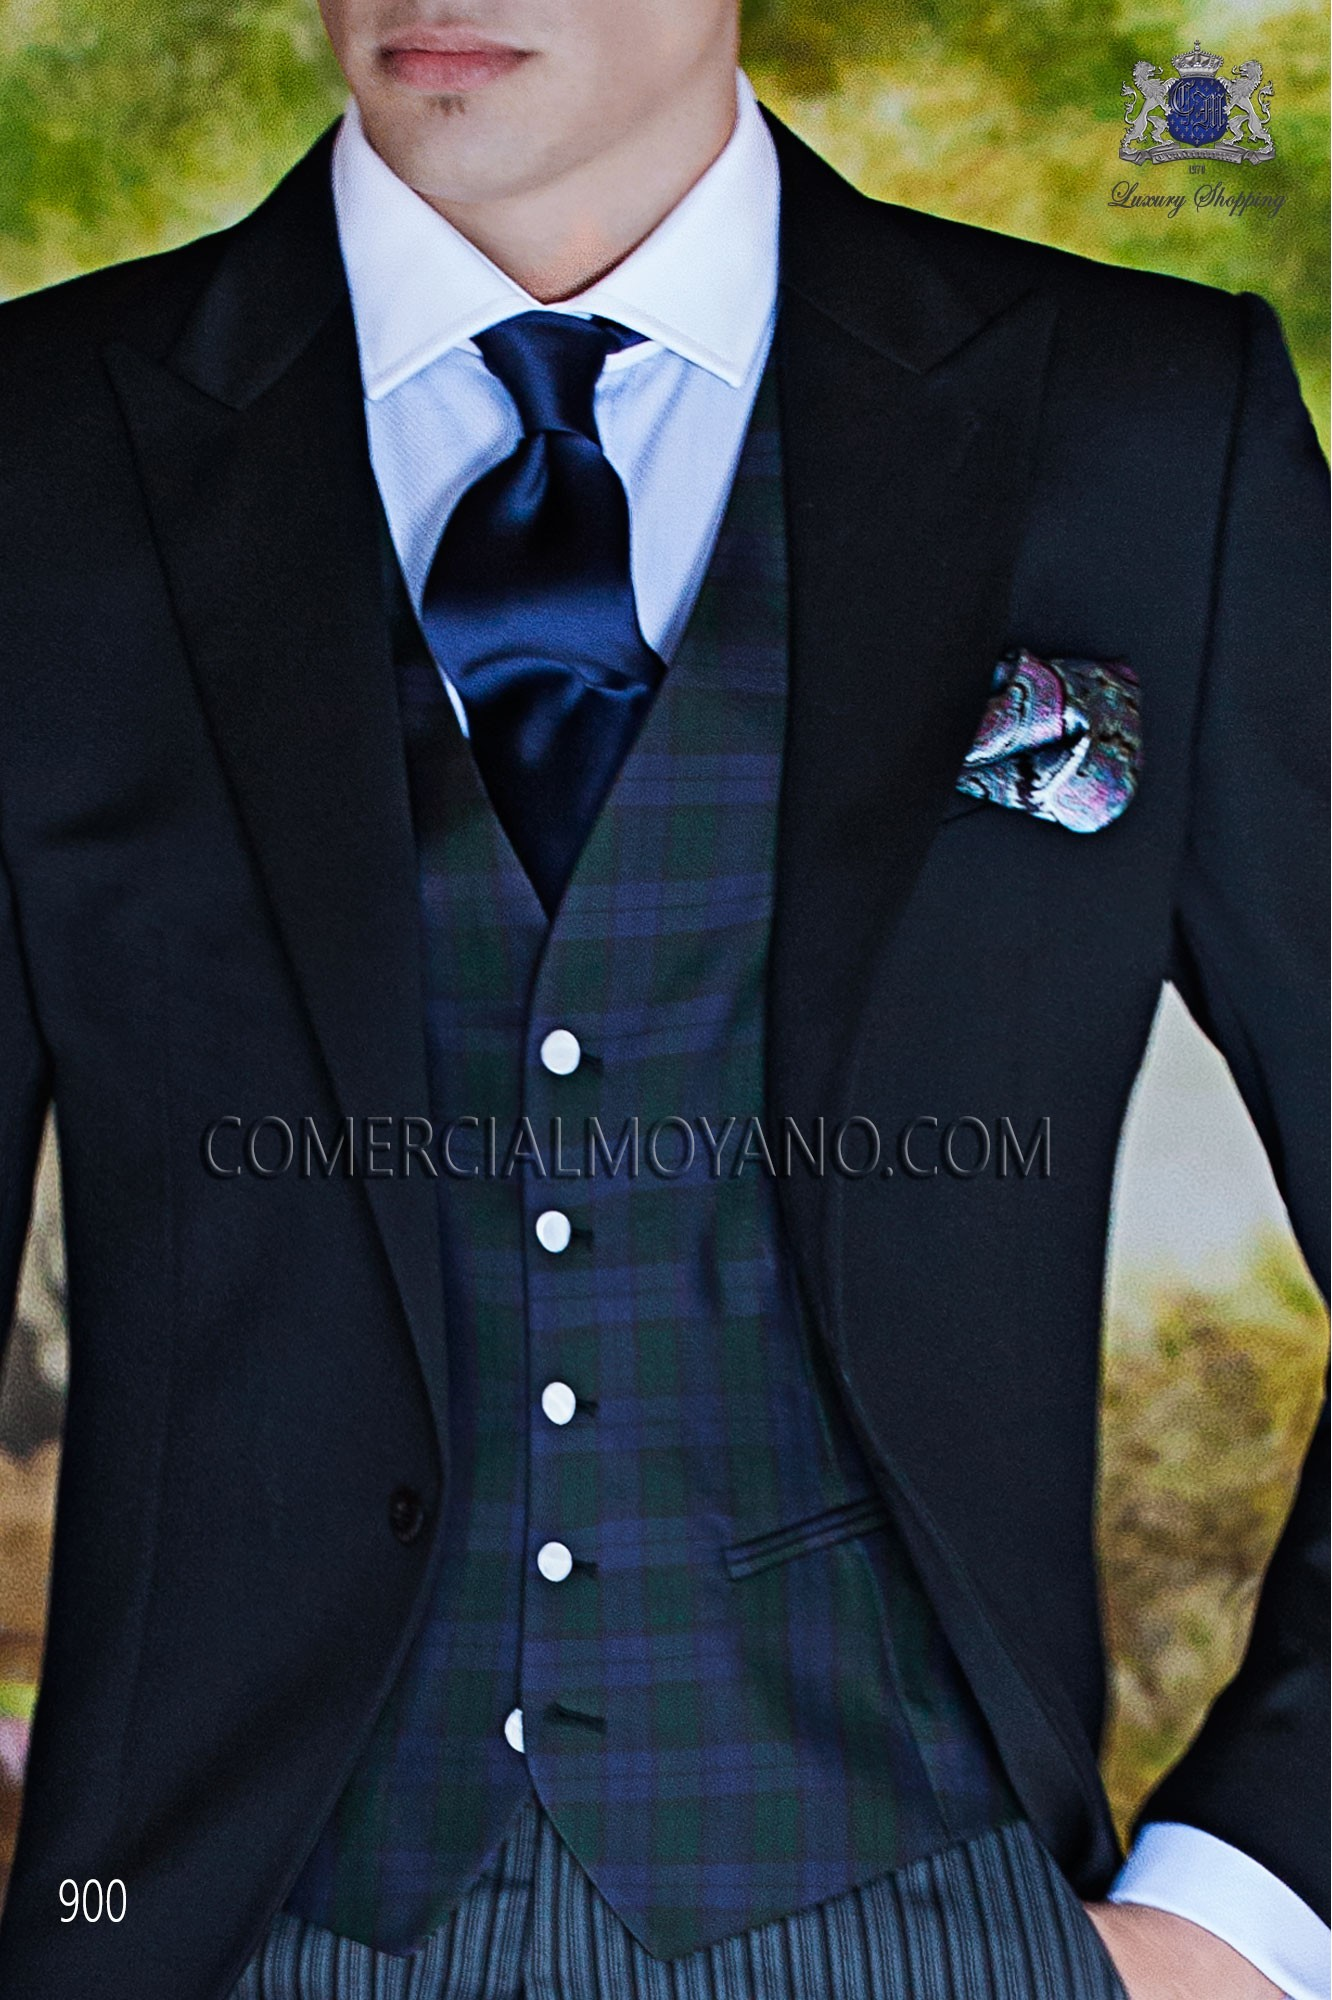 Italian gentleman black men wedding suit, model: 900 Ottavio Nuccio Gala 2017 Gentleman Collection